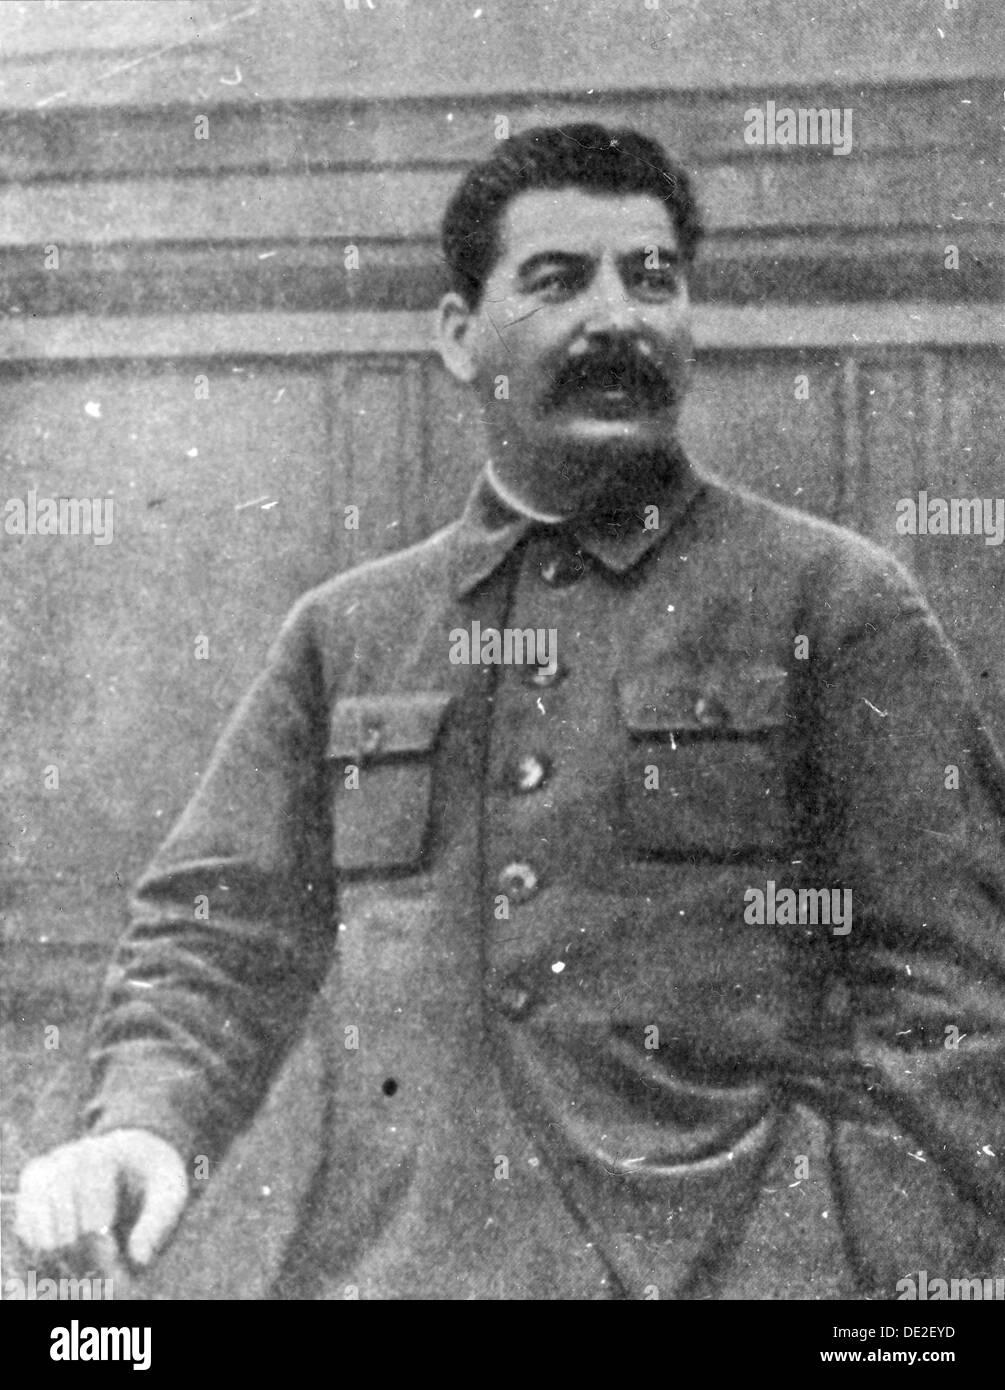 Josef Stalin, Georgian-born Soviet communist revolutionary and leader, 1930s. - Stock Image